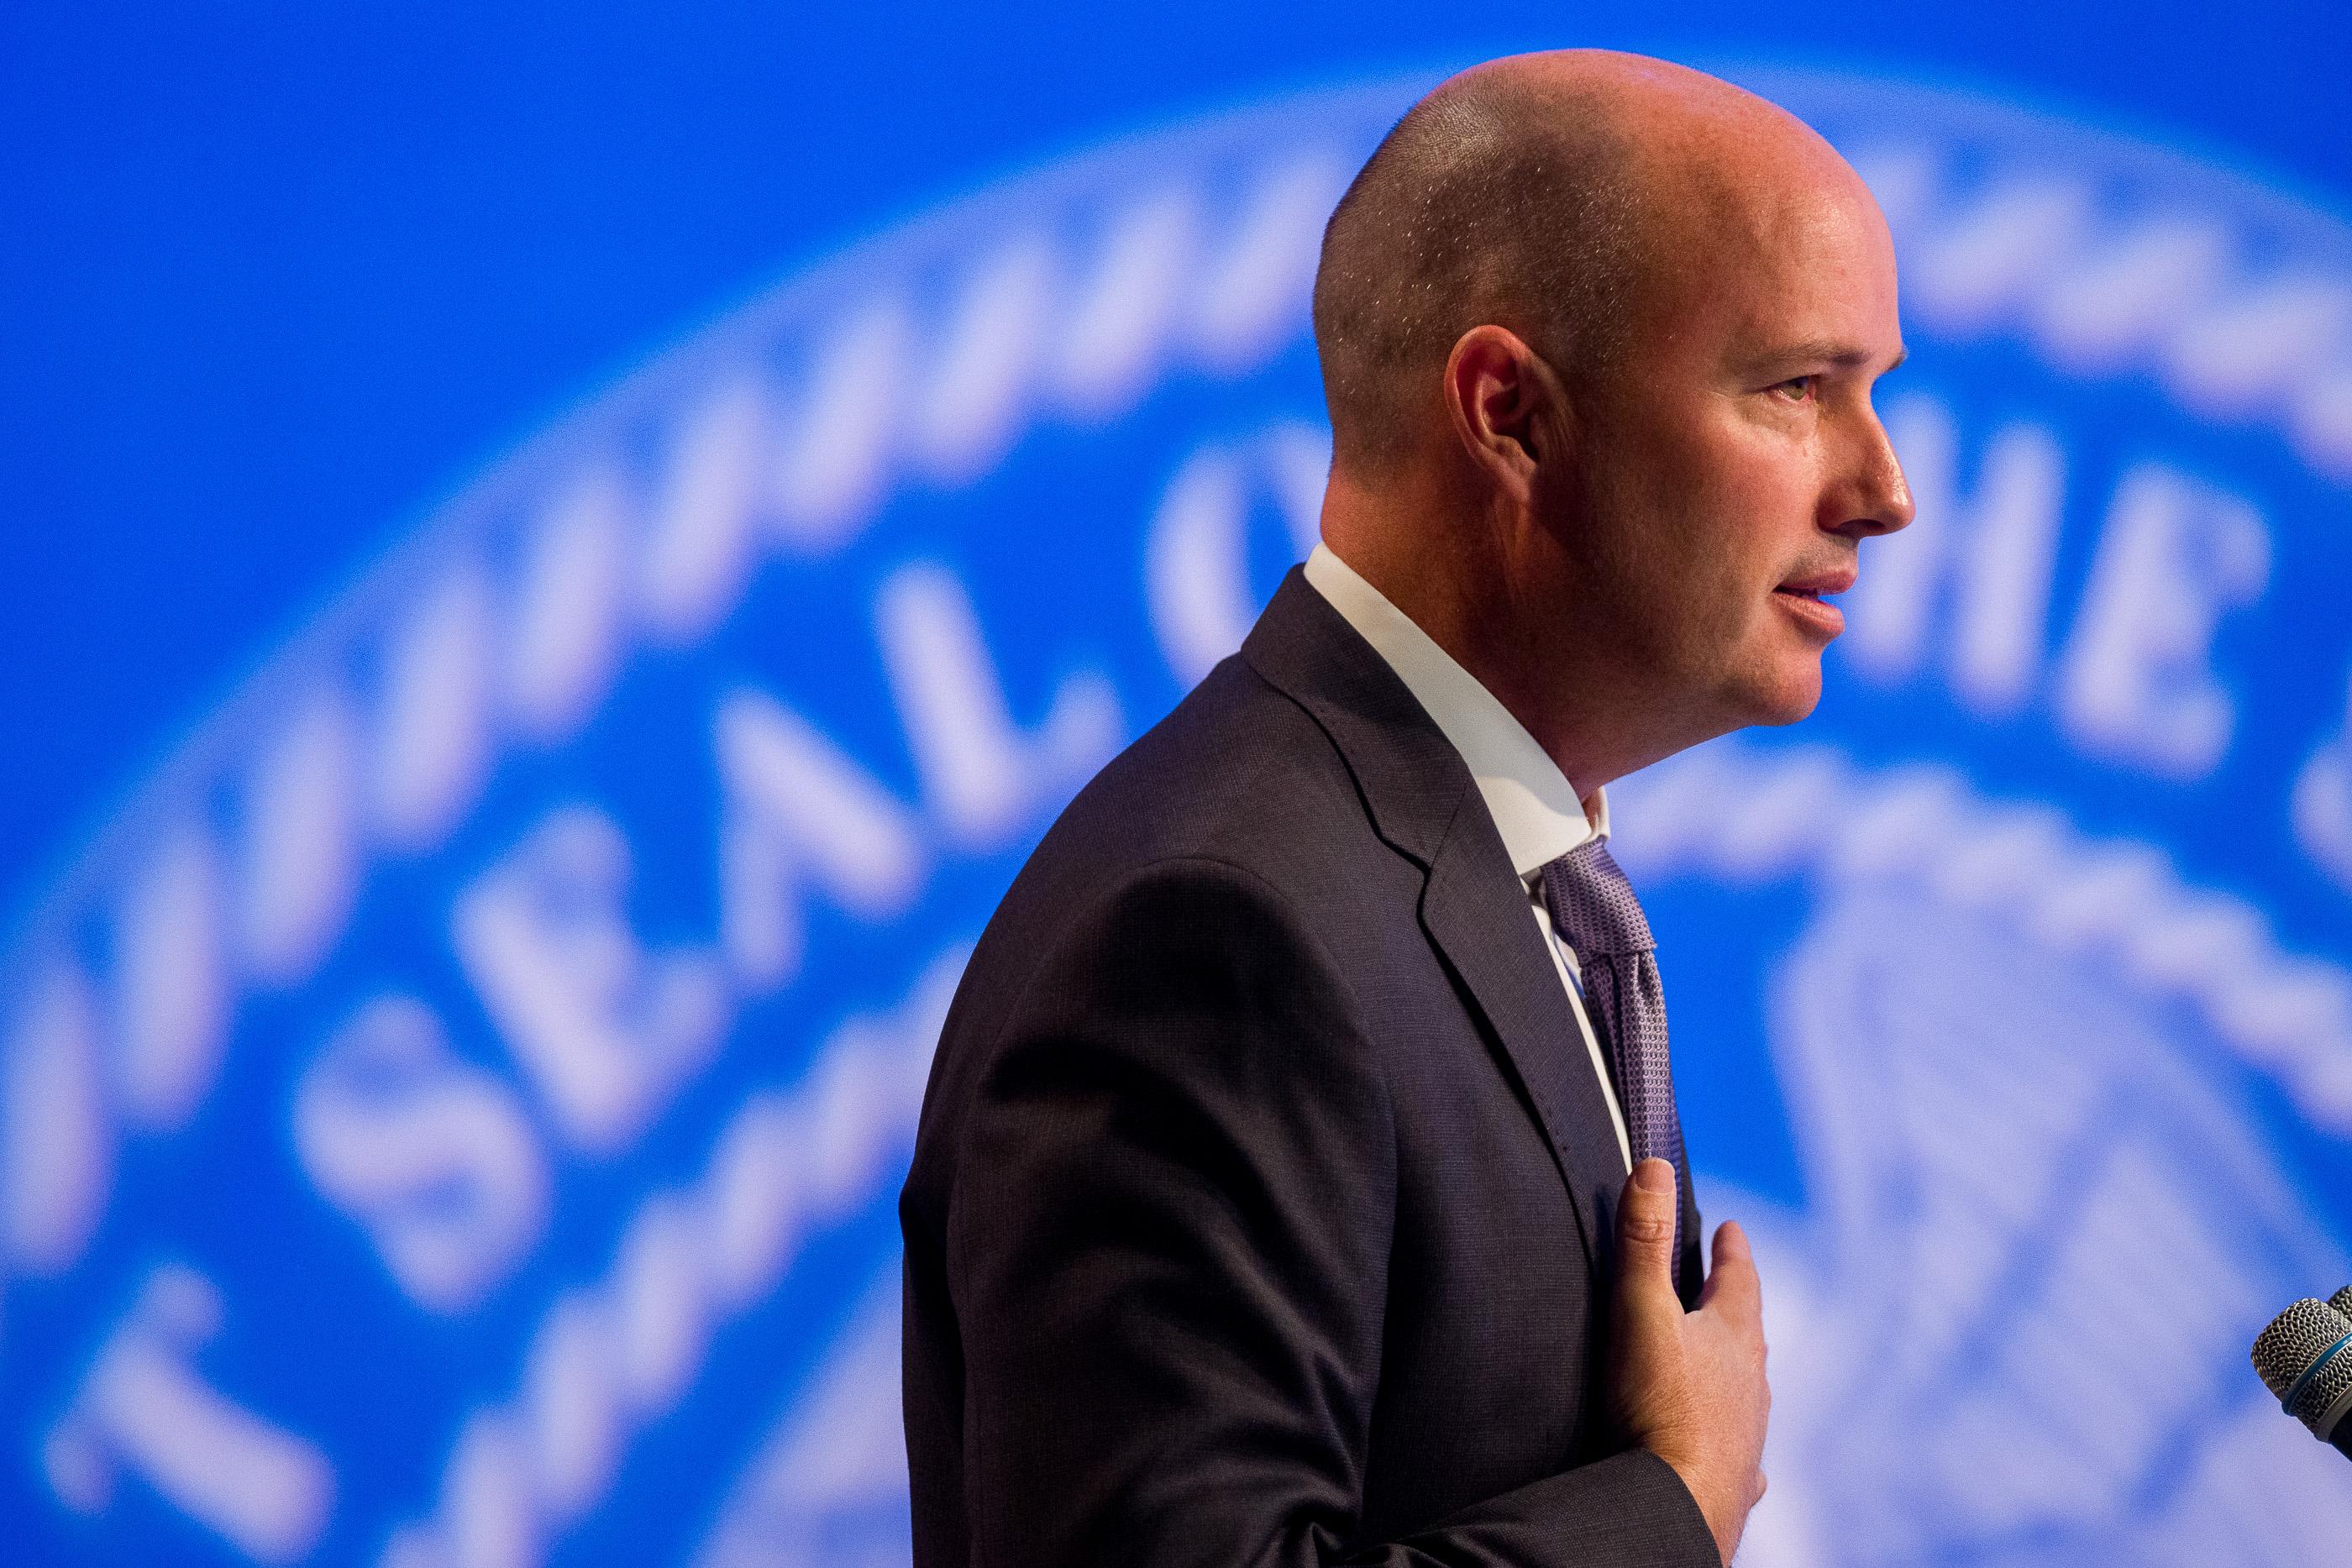 Gov. Spencer Cox speaks at his monthly news conference at PBS Utah in Salt Lake City on Thursday, Sept. 30, 2021.